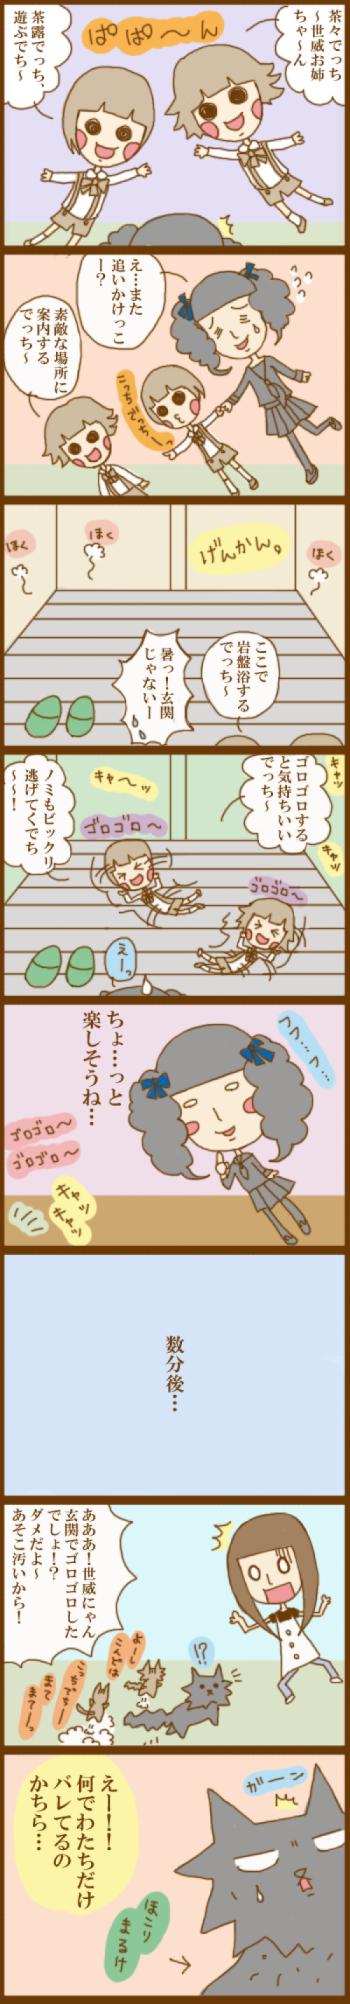 f:id:suzuokayu:20201125102308j:plain